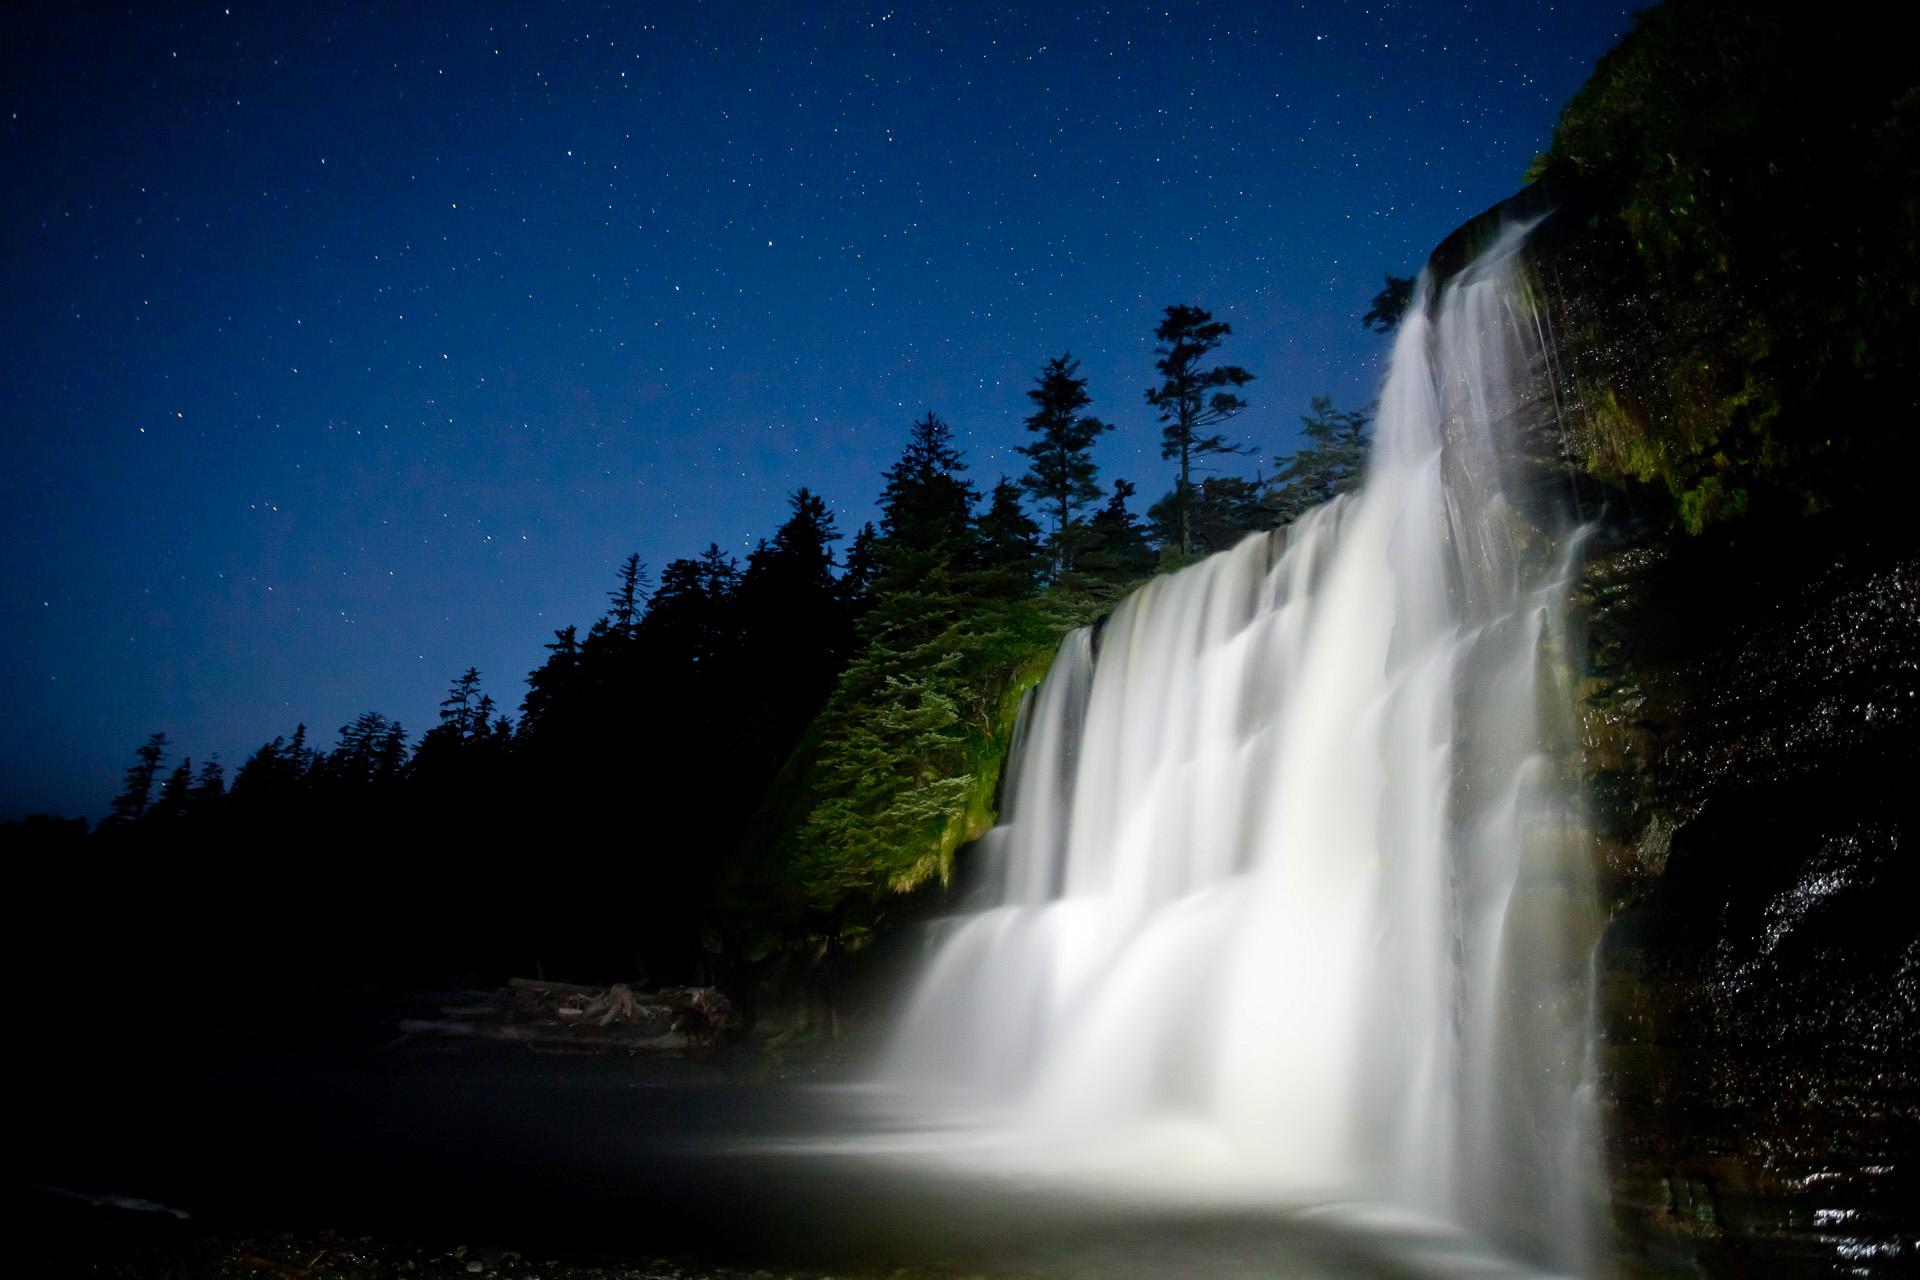 west-coast-trail-tsusiat-falls-night-time.jpg